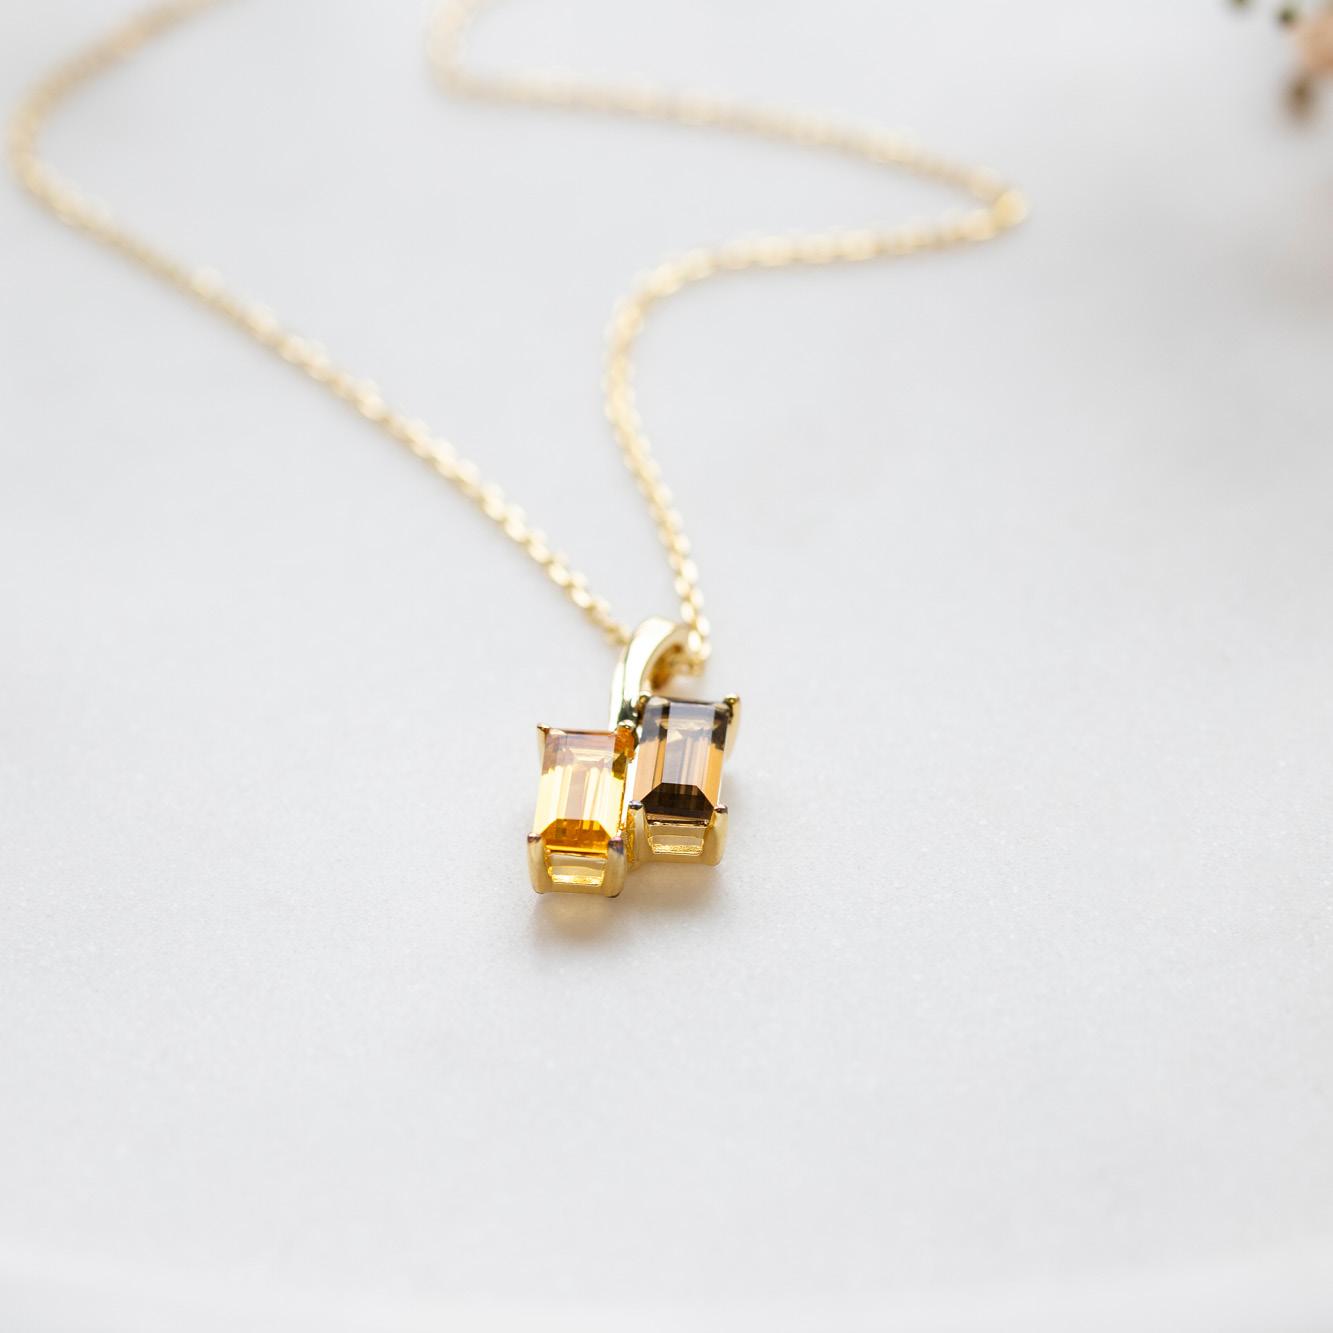 Damen Halskette Silber 925 Vergoldet Citrin Quarz